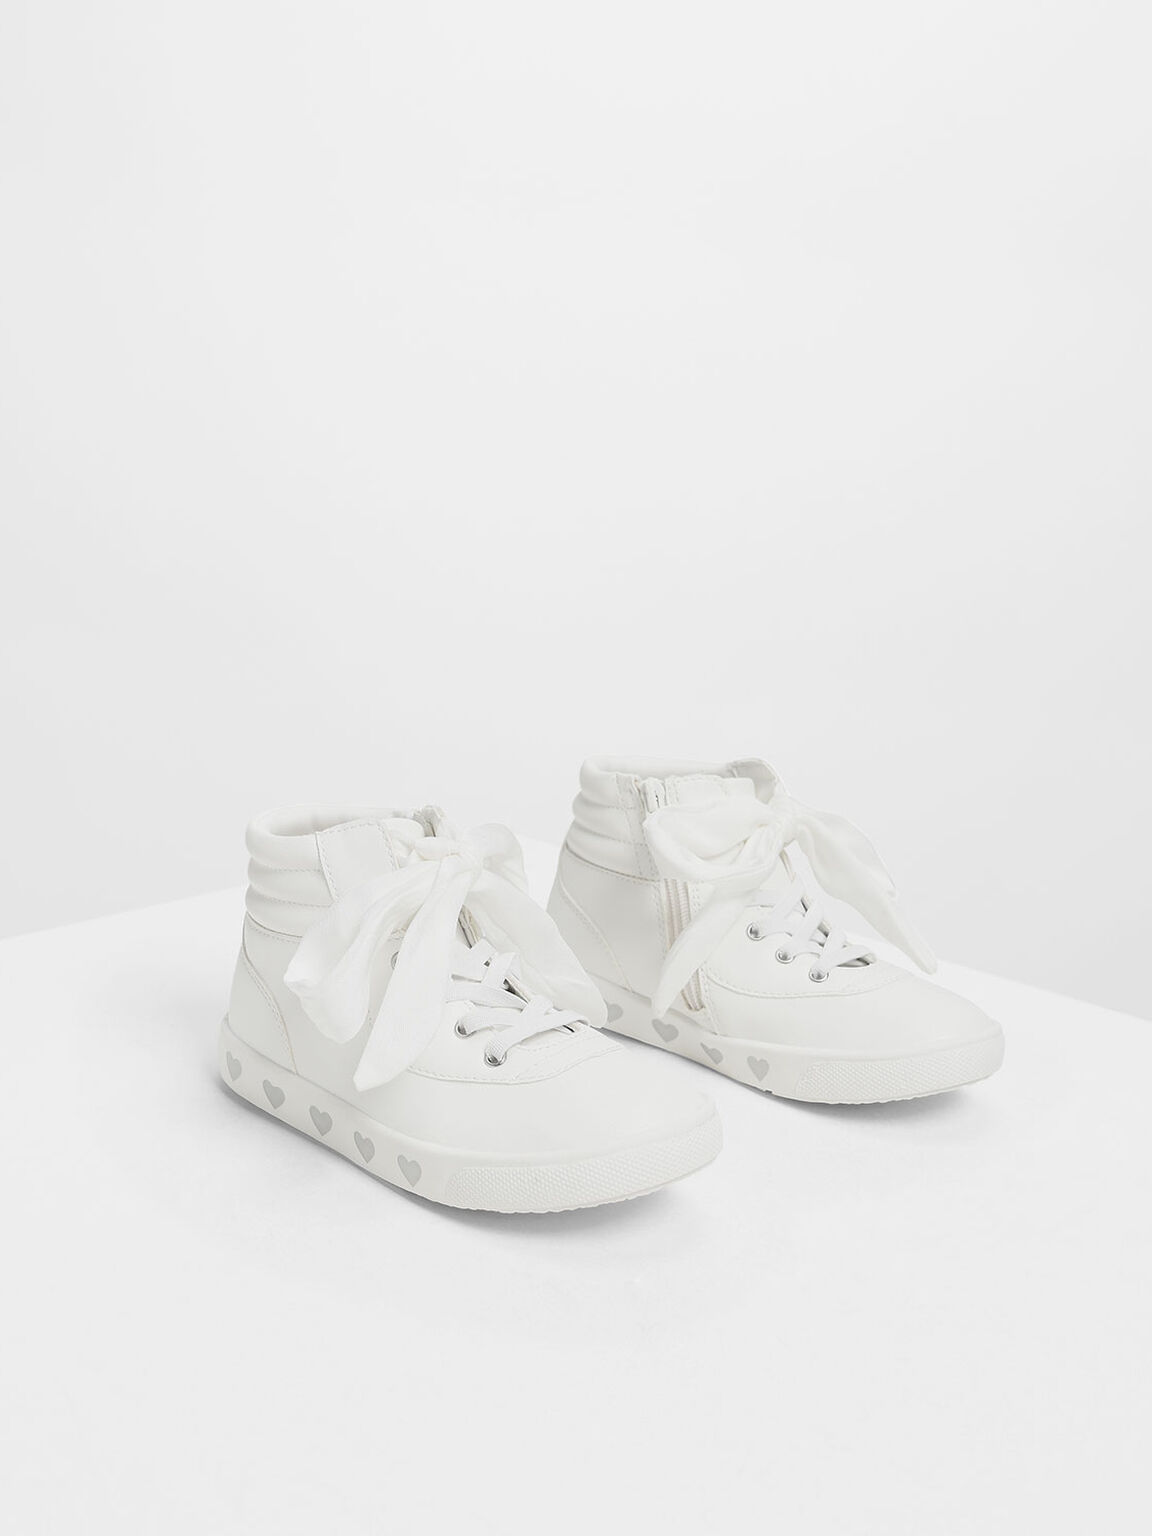 Kids' Heart Print High-Top Sneakers, White, hi-res